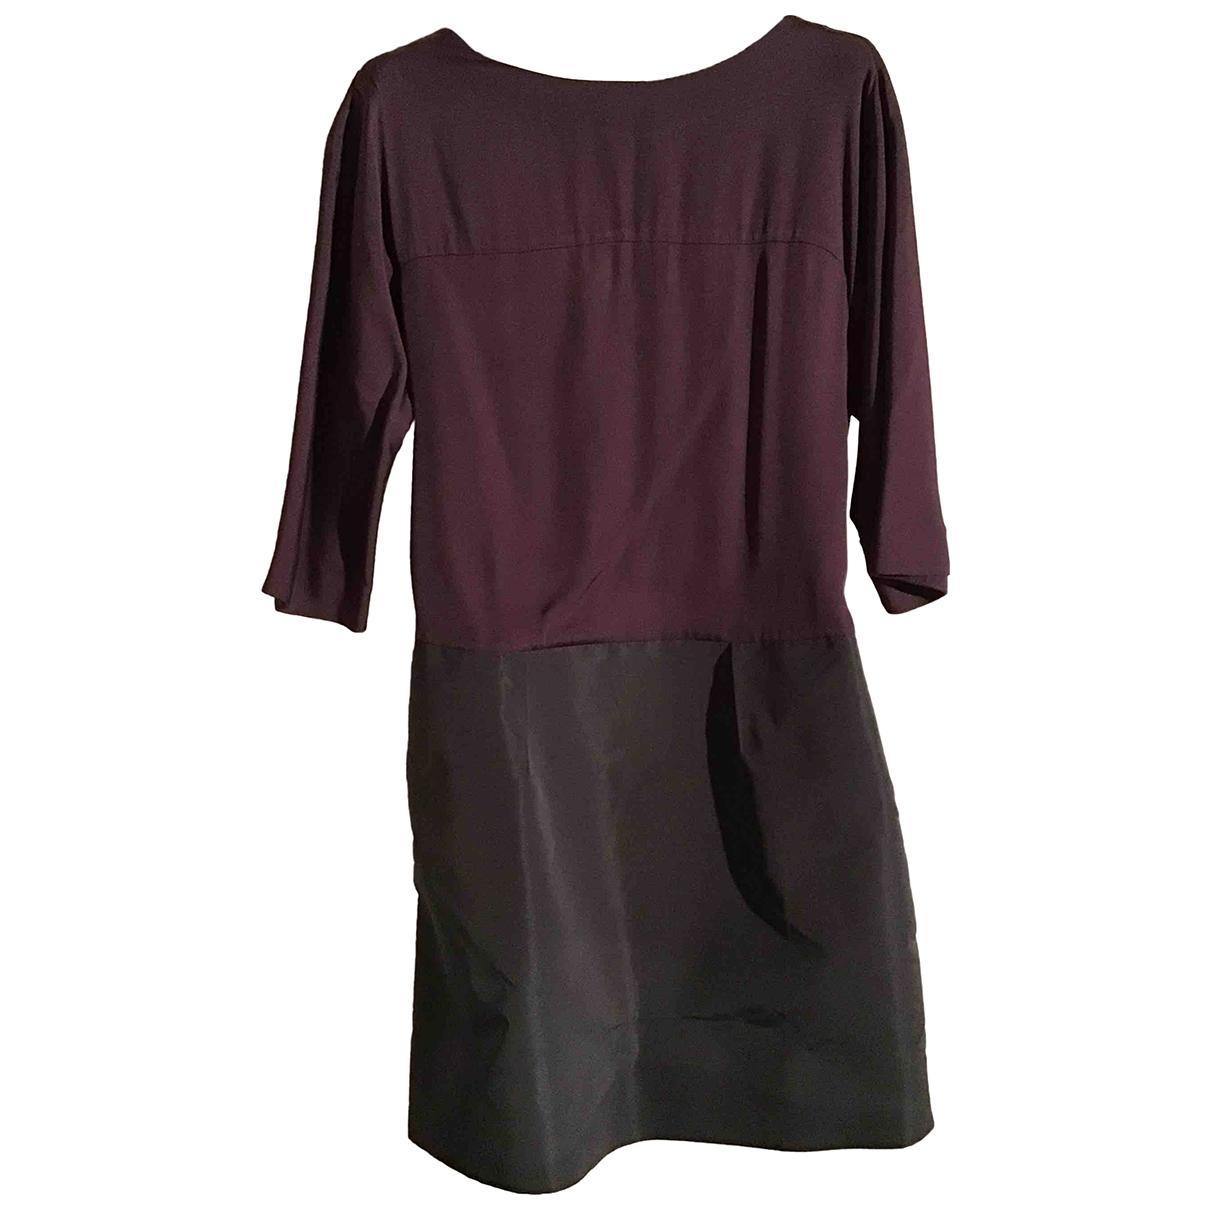 Marni \N Silk dress for Women 40 IT